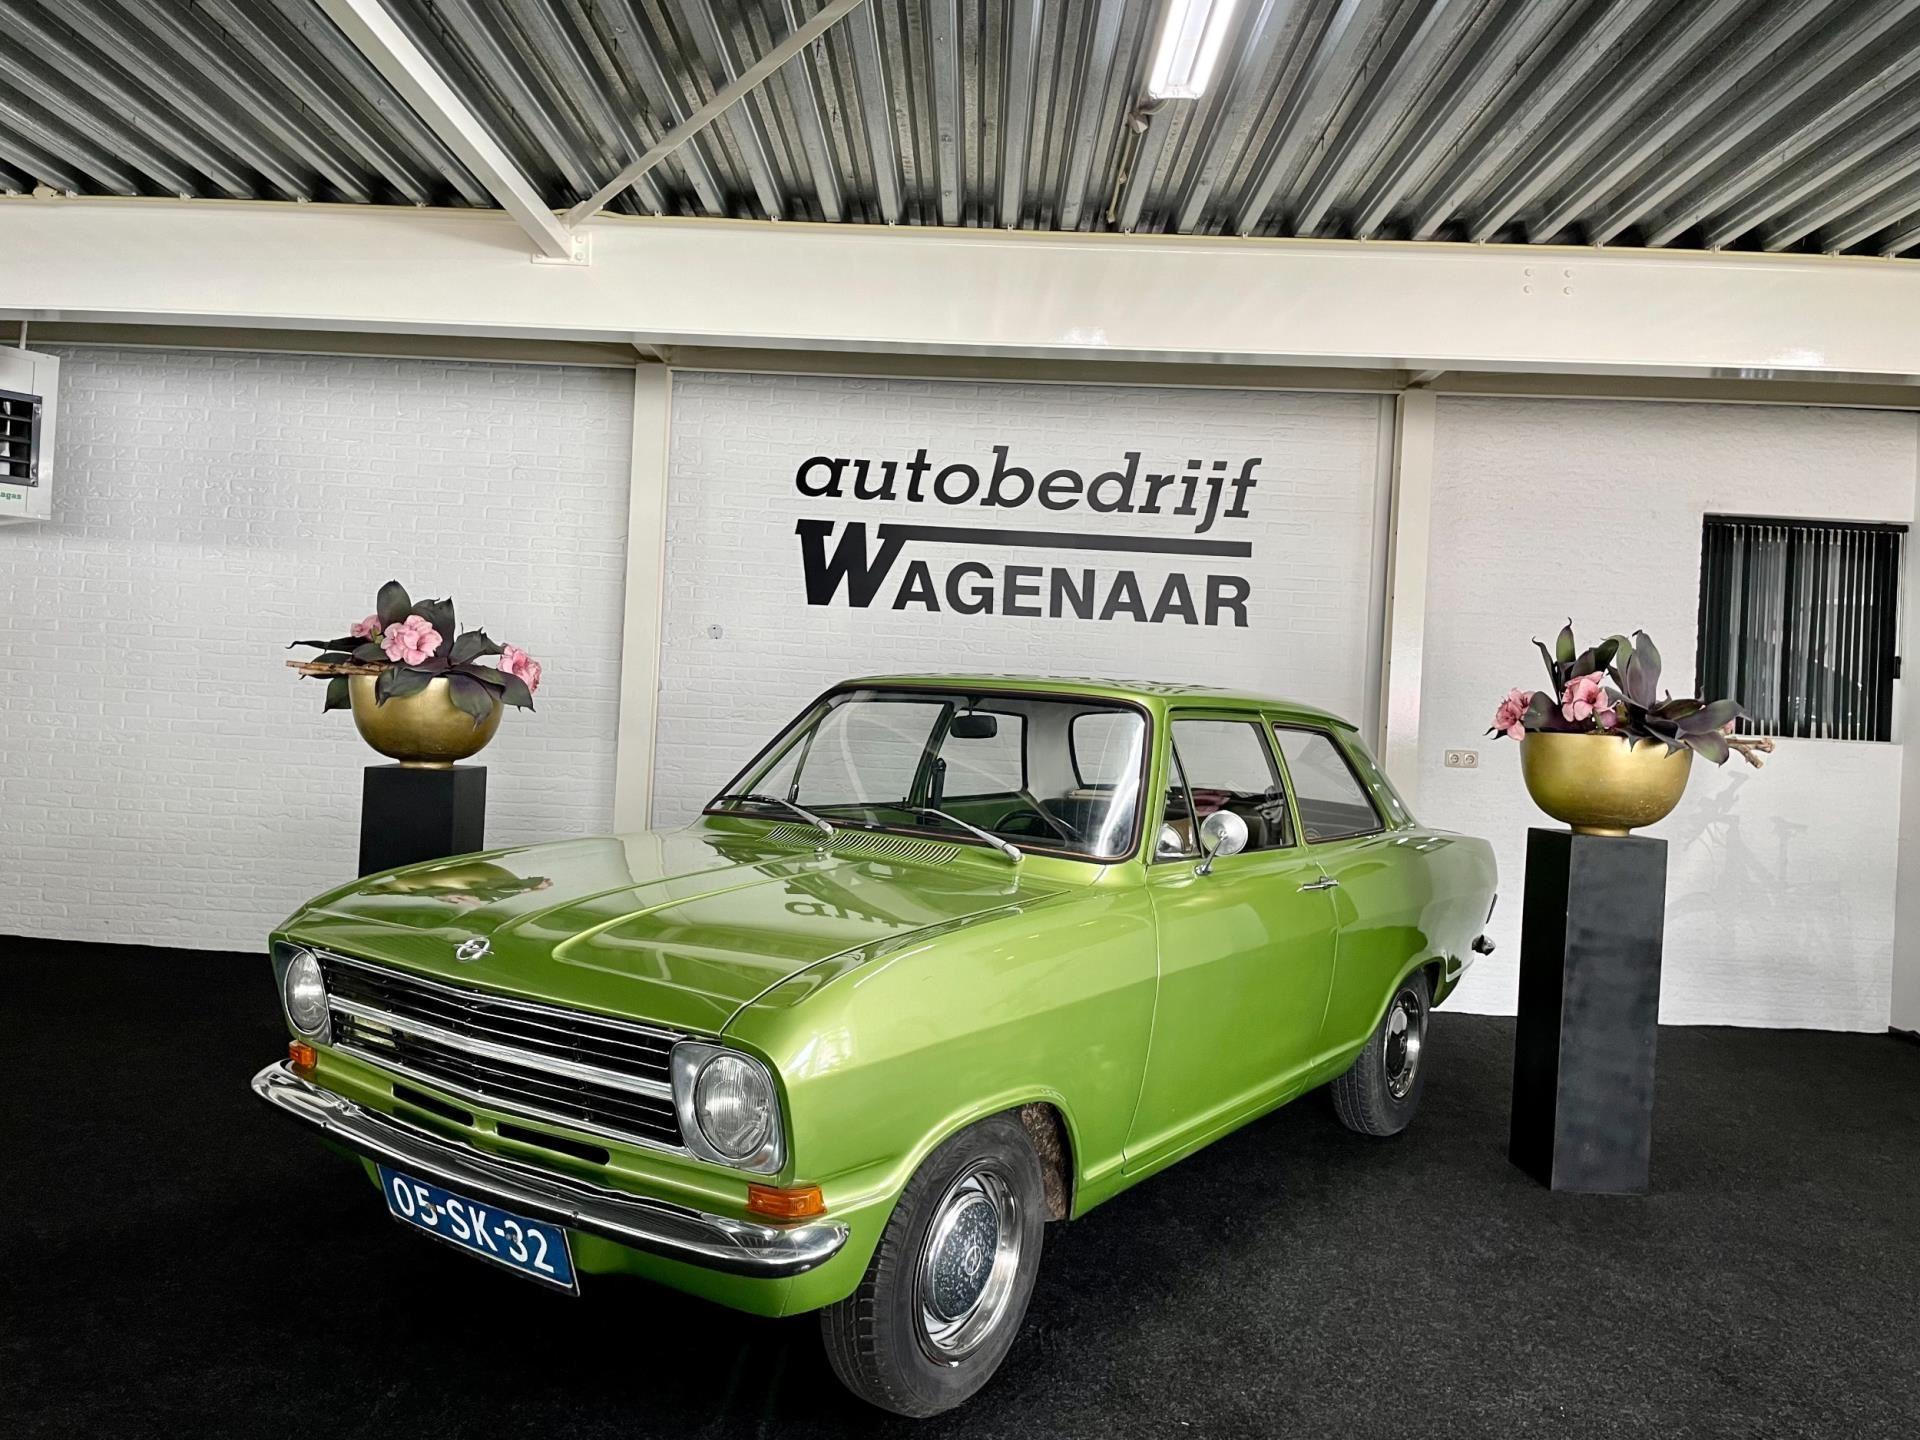 Opel KADETT AUTOMAAT occasion - Autobedrijf Wagenaar